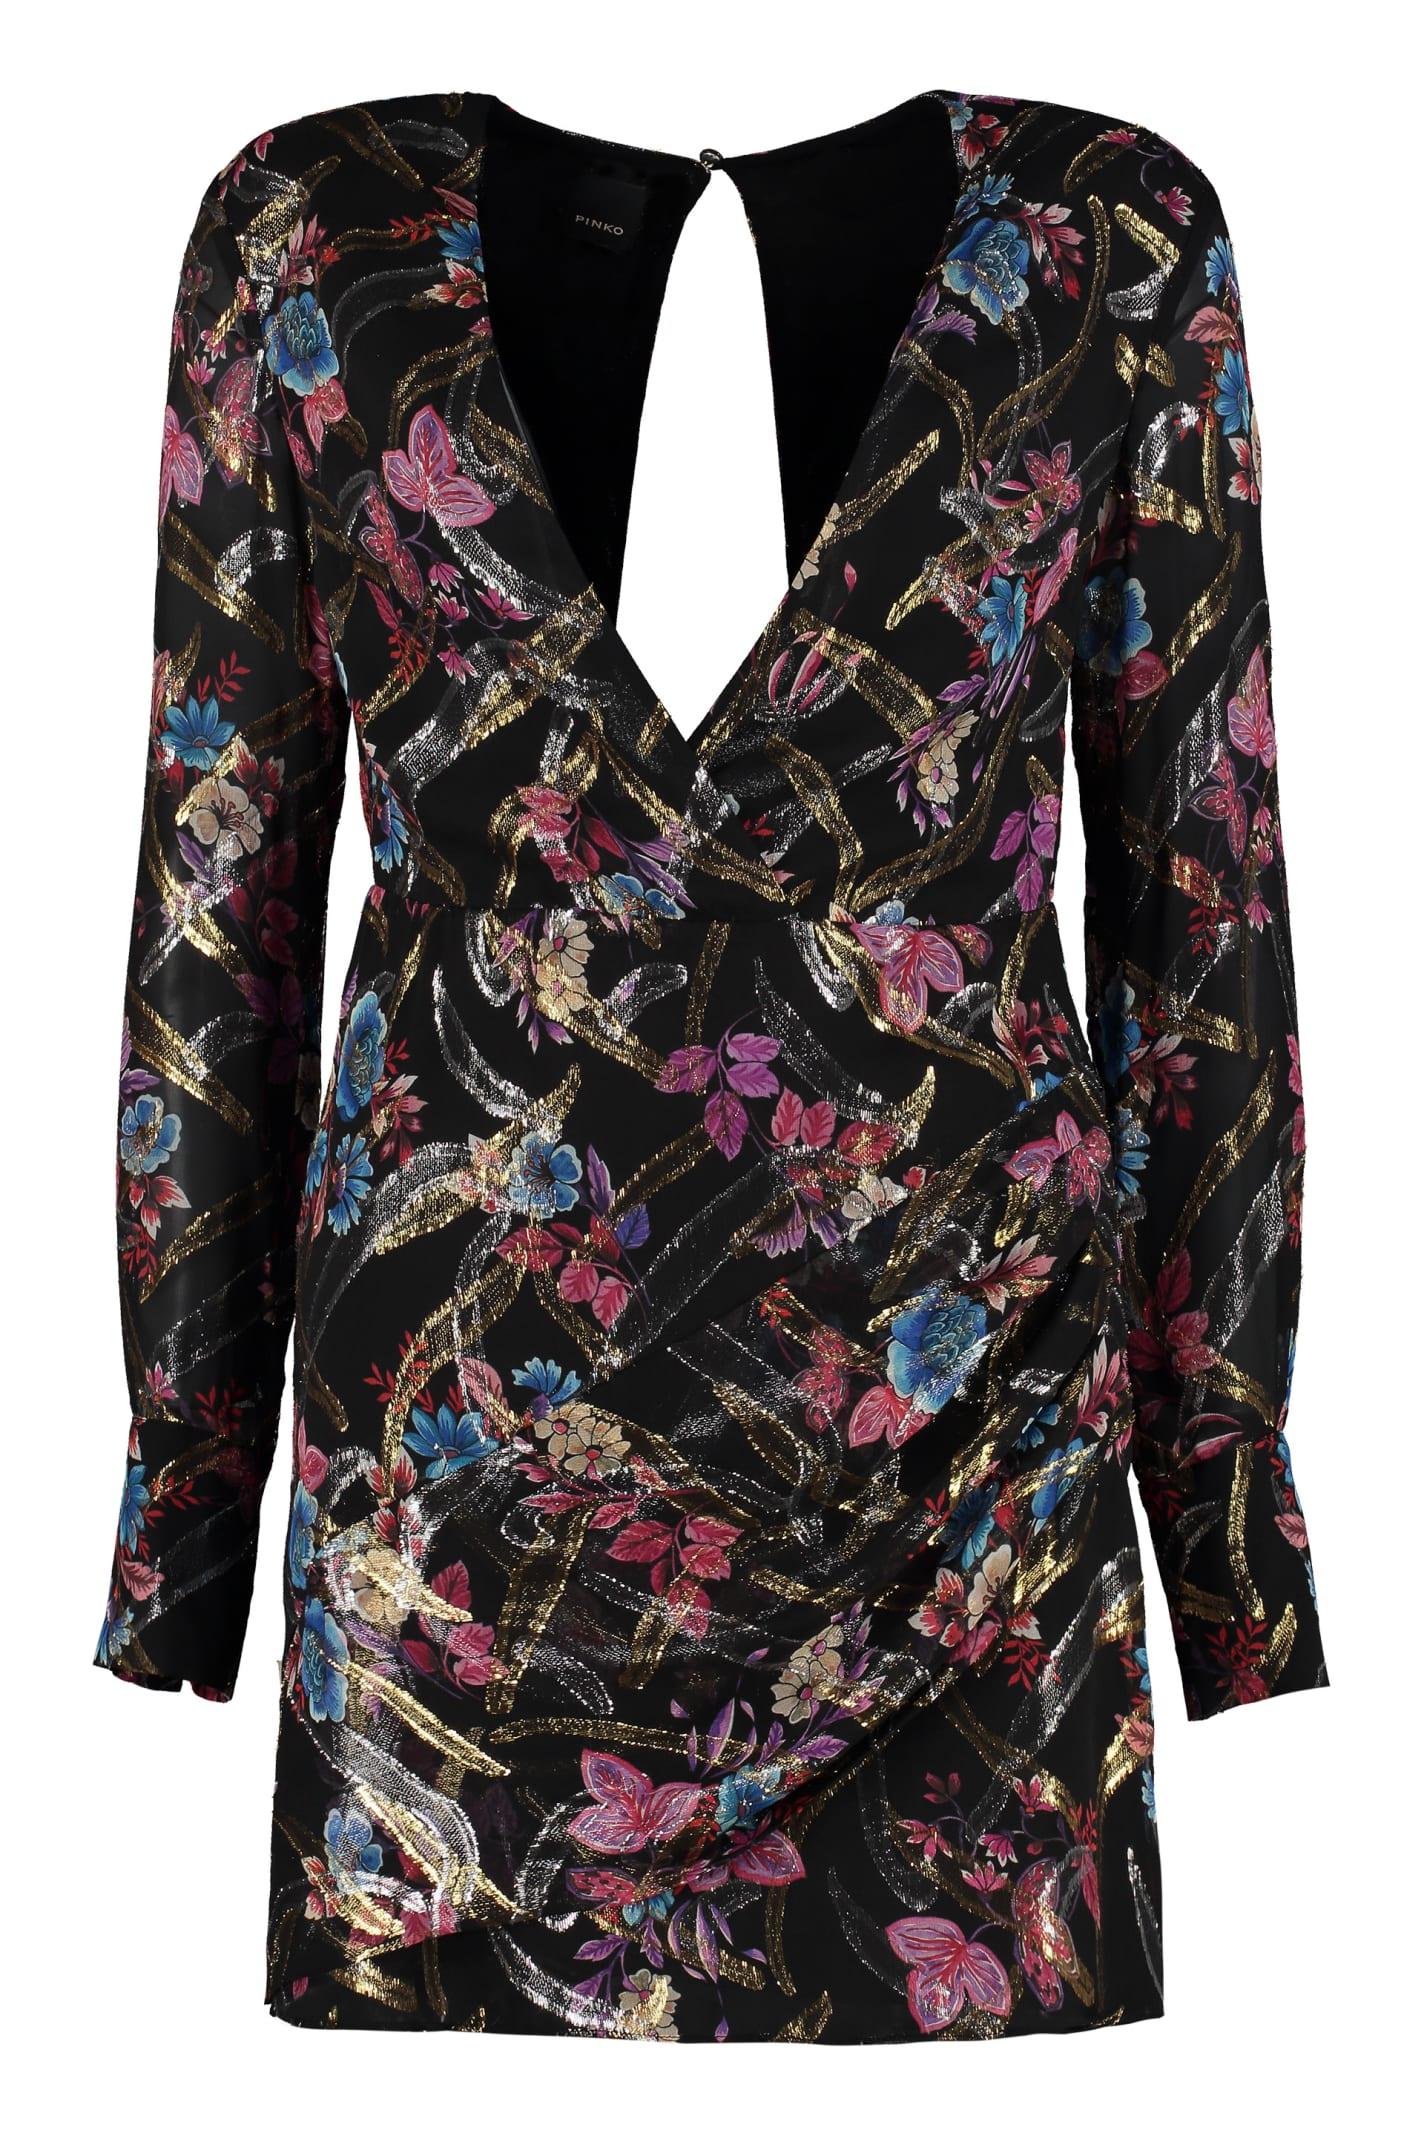 Pinko Stupefare Silk Floral Dress